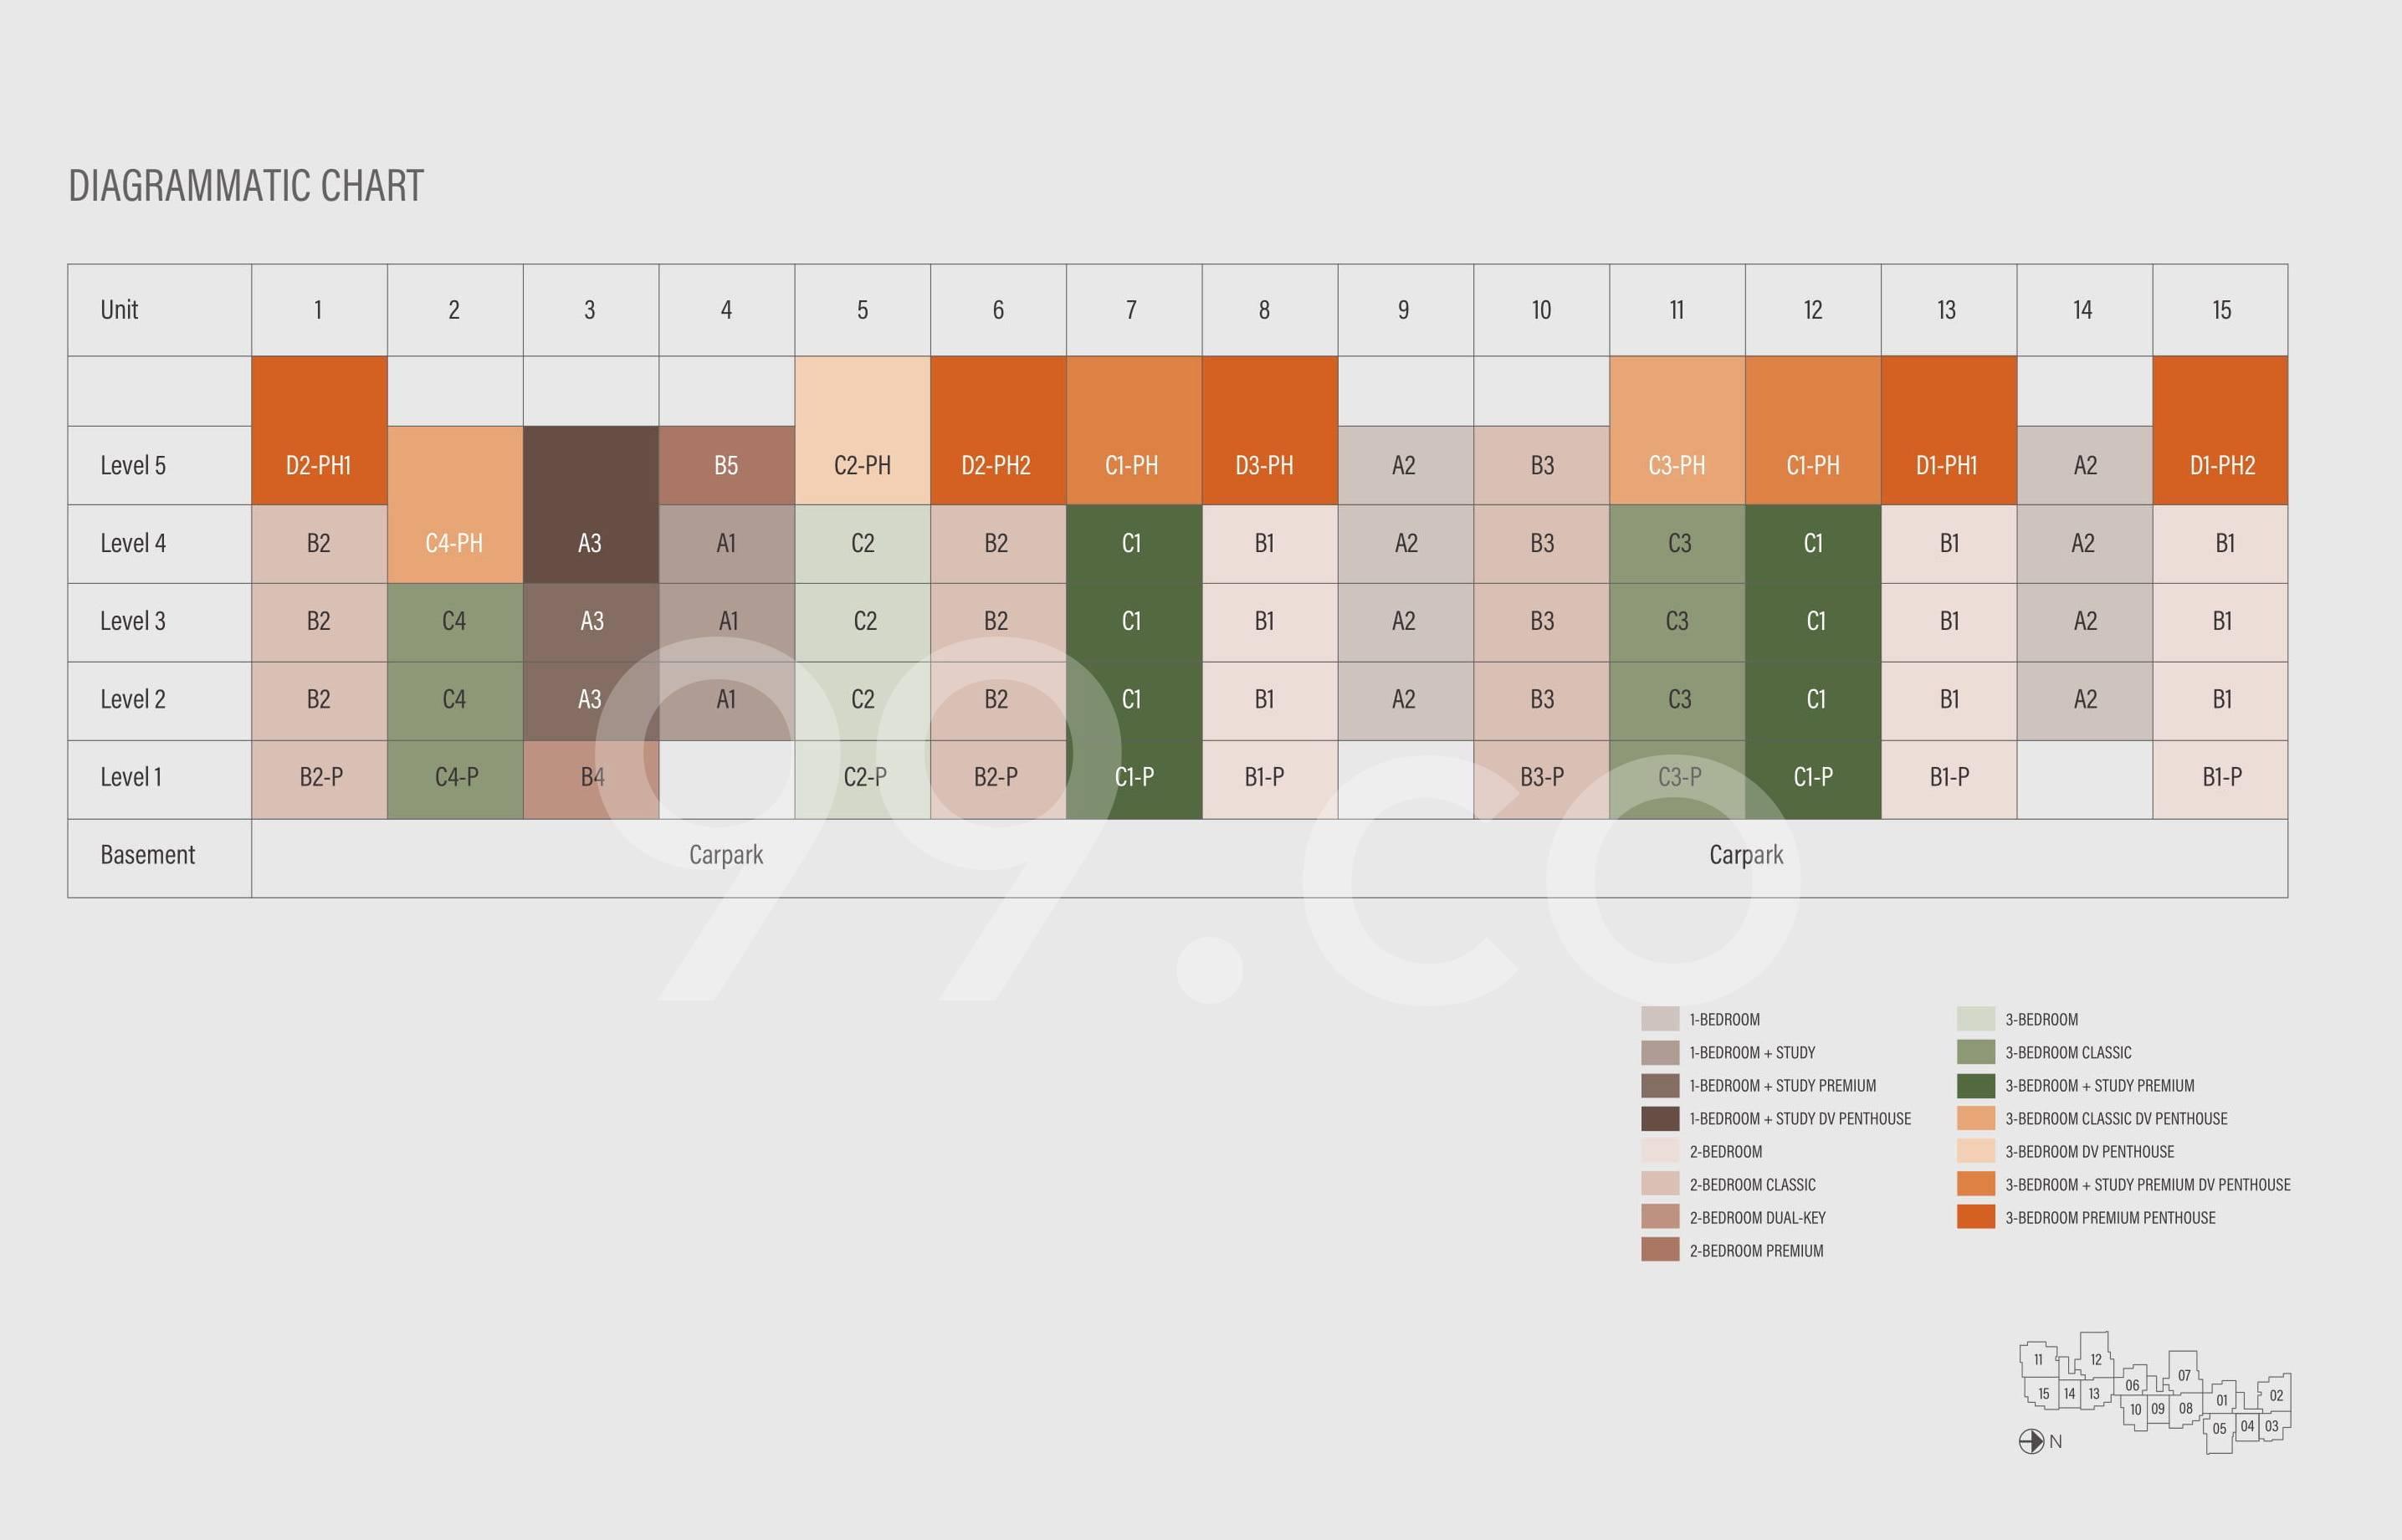 35 Gilstead elevation chart